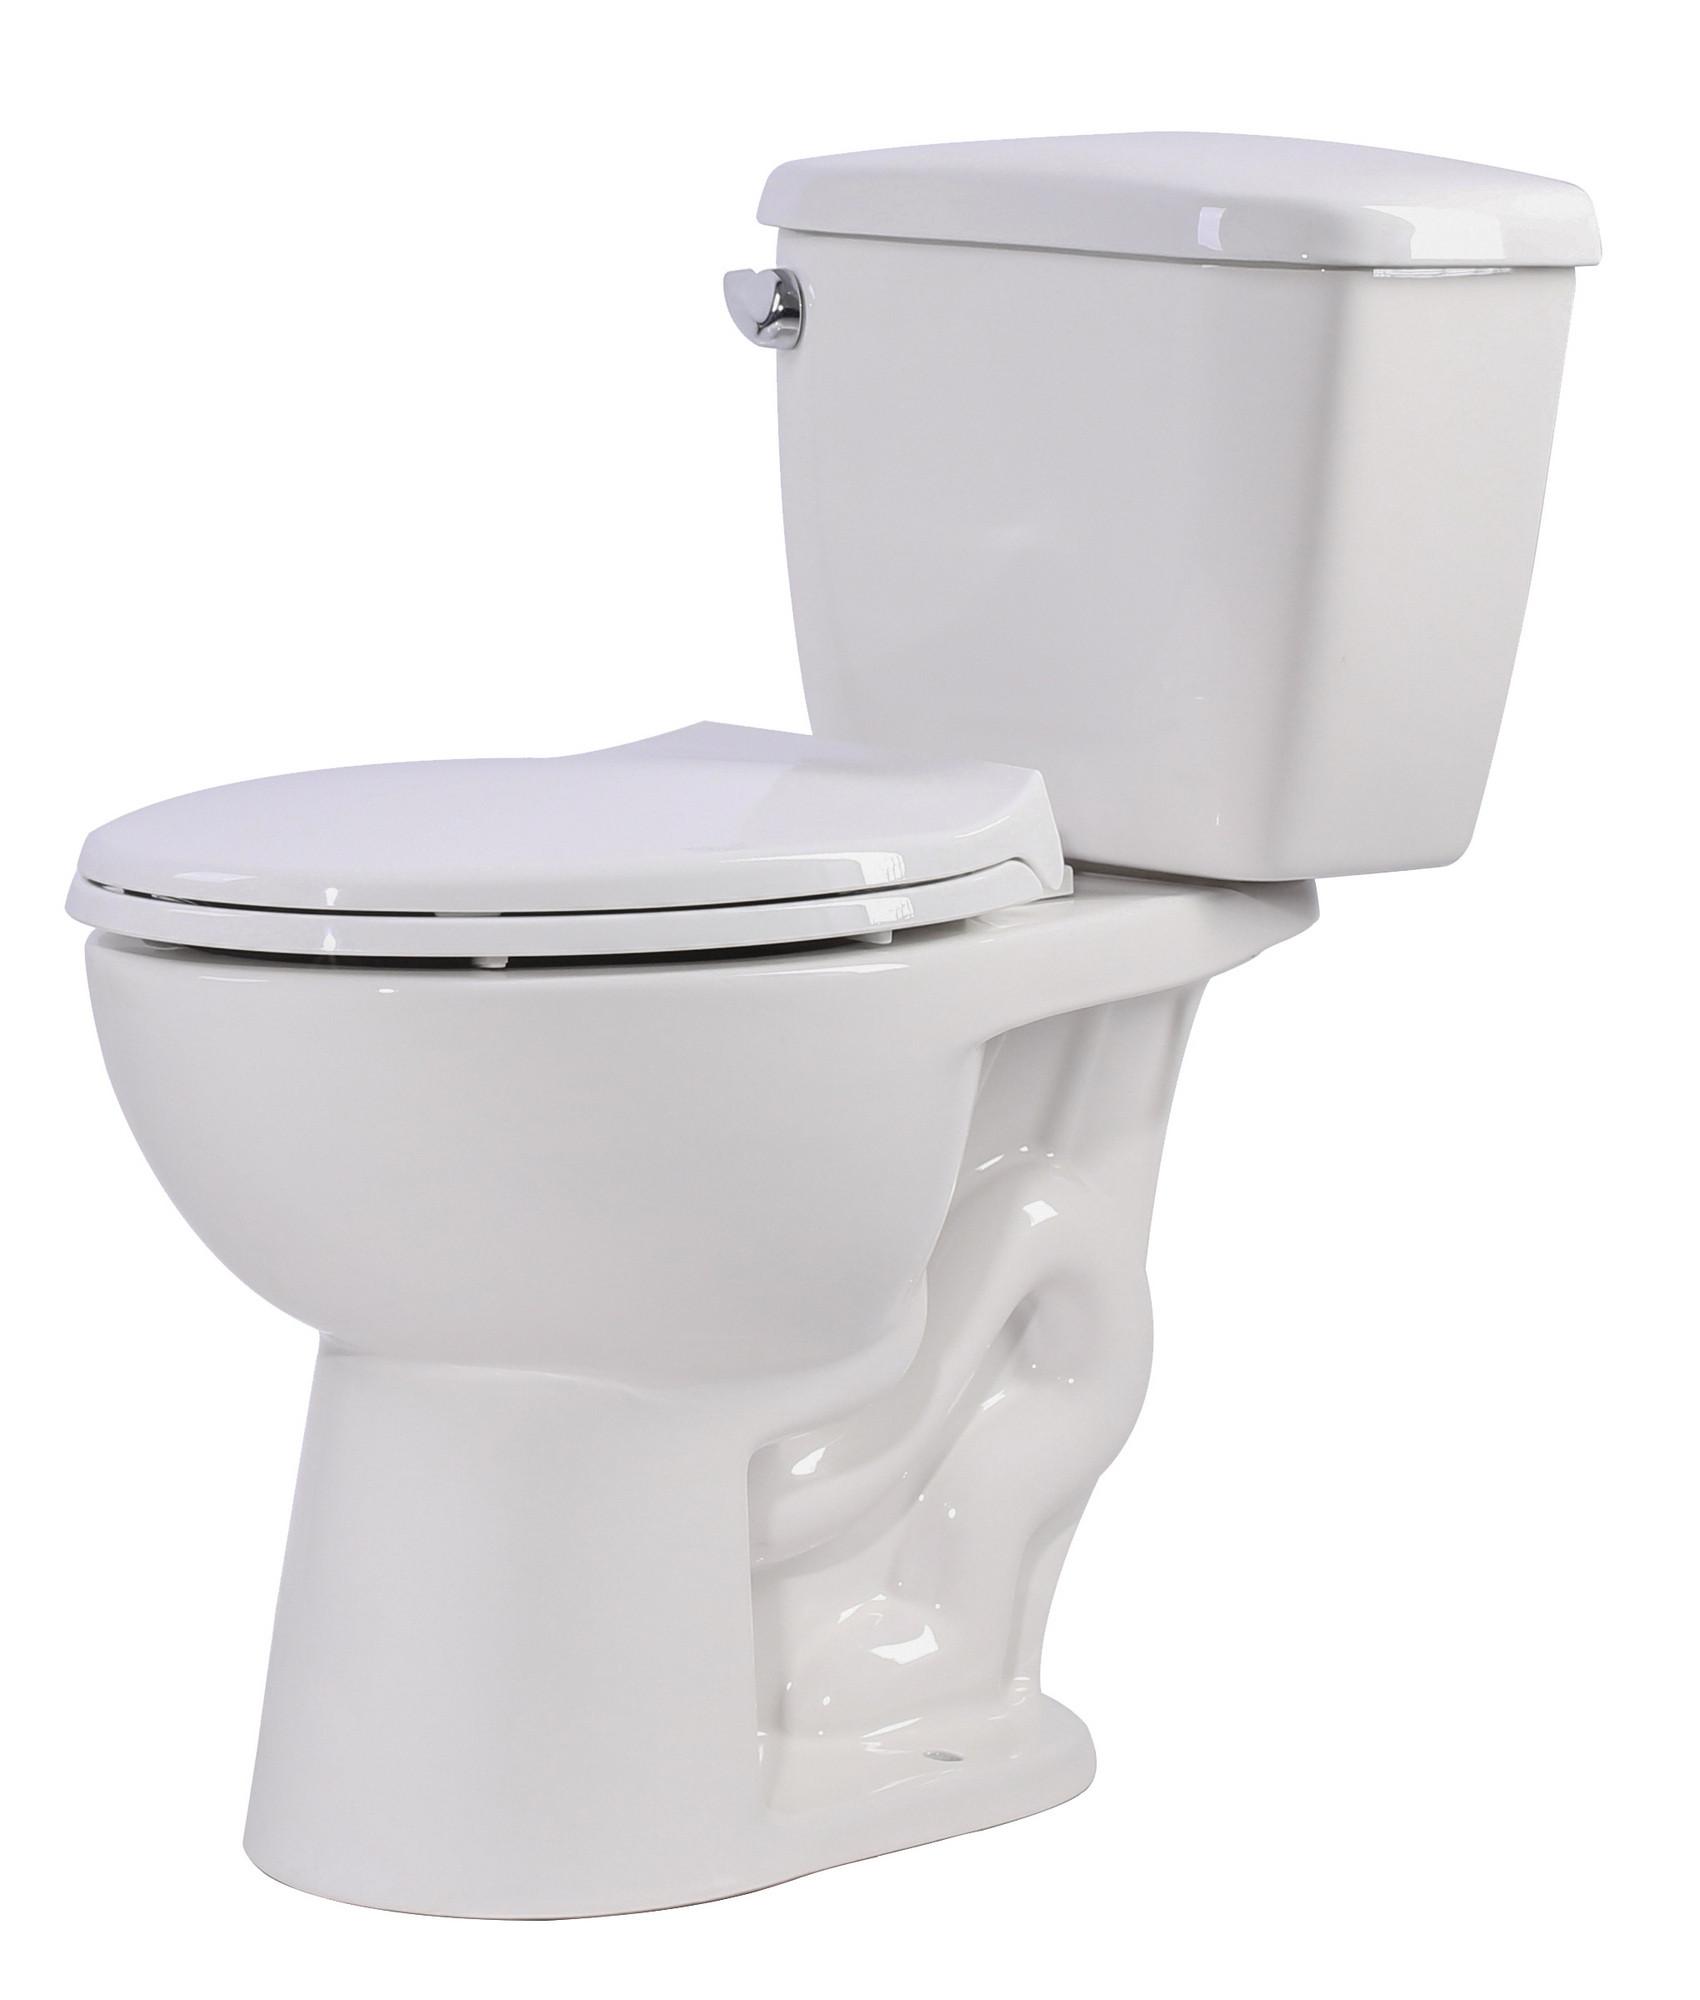 ANZZI T1-AZ063 Cavalier 2 Piece Single Flush Bathroom Toilet In White